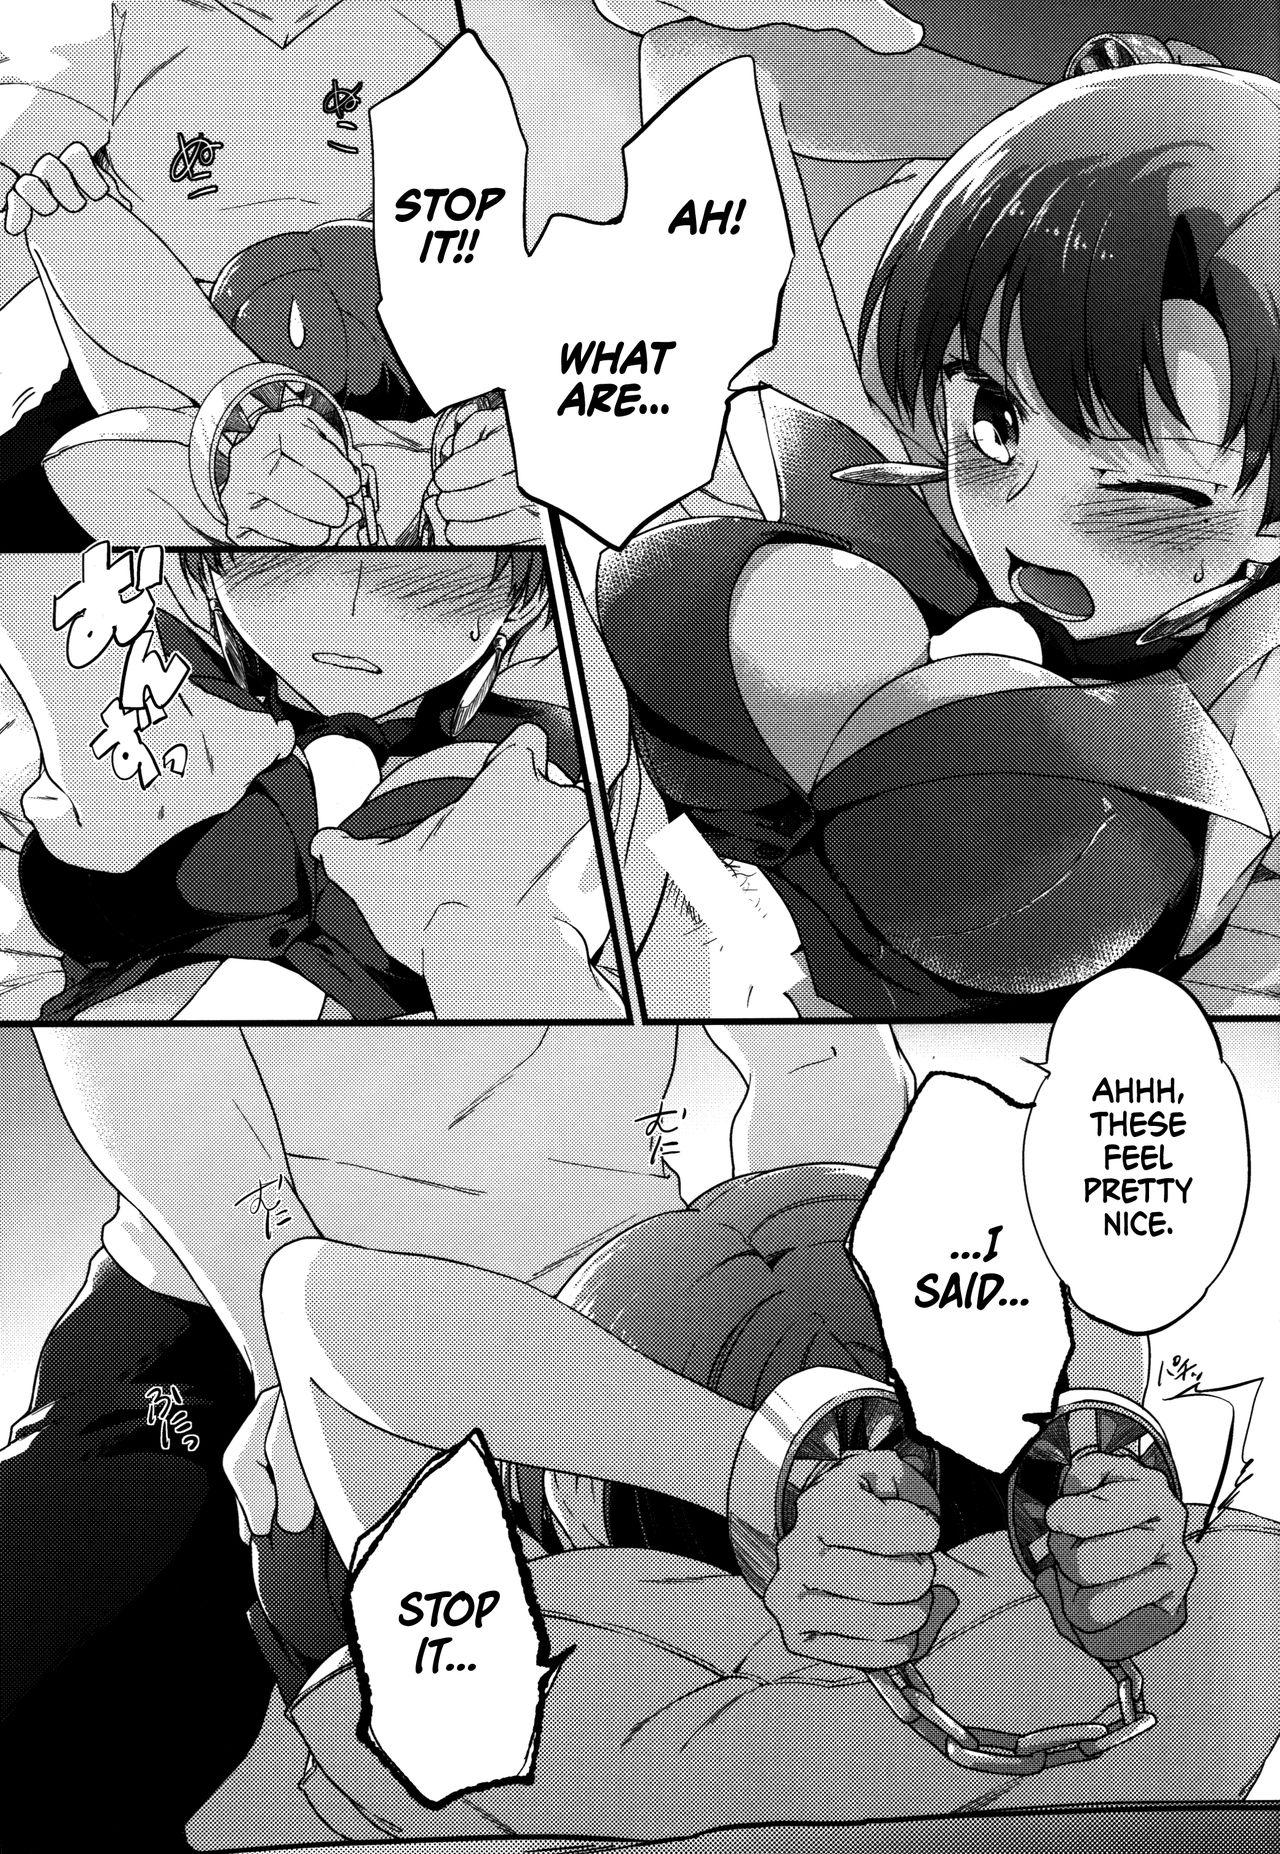 (C90) [Gokutsubushi (Misoiri)] Chiisai Lancer ga Bazett-san node Ookiku Naru | Little Lancer turns huge because of Bazett-san (Fate/hollow Ataraxia) [English] [EHCOVE] 8